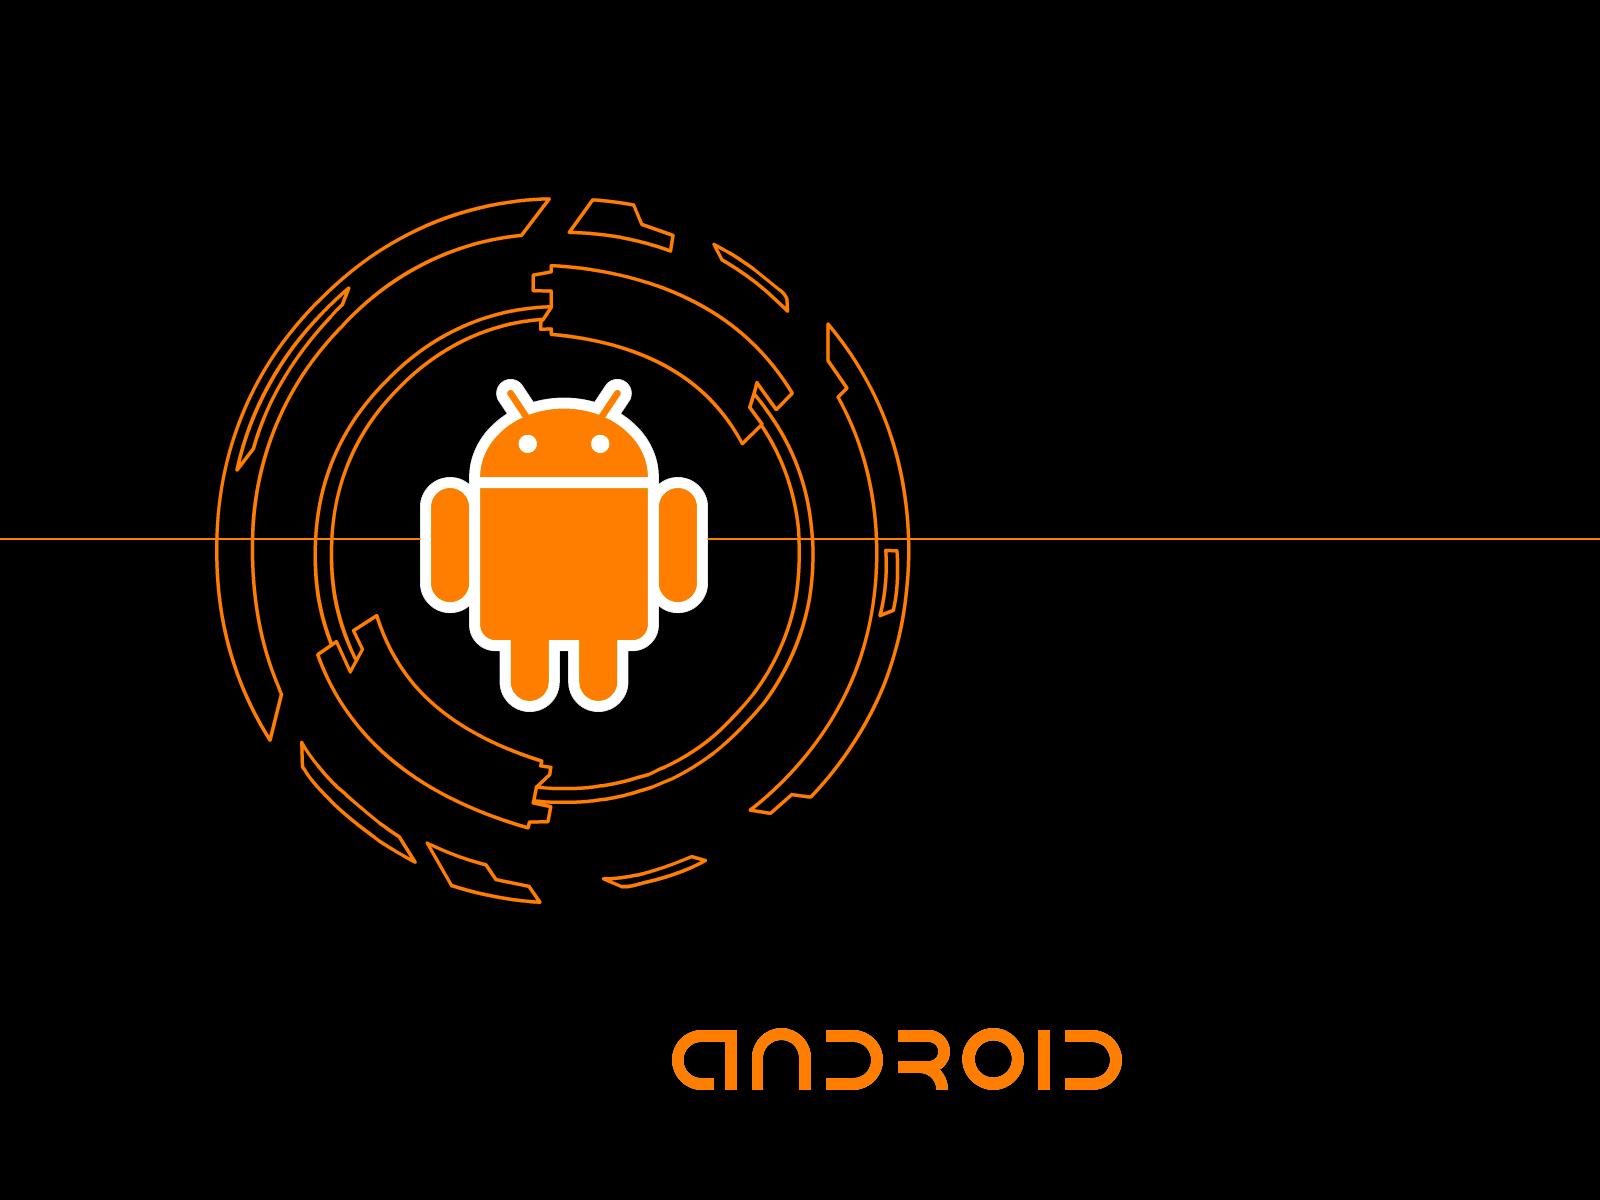 orange_android_wallpaper